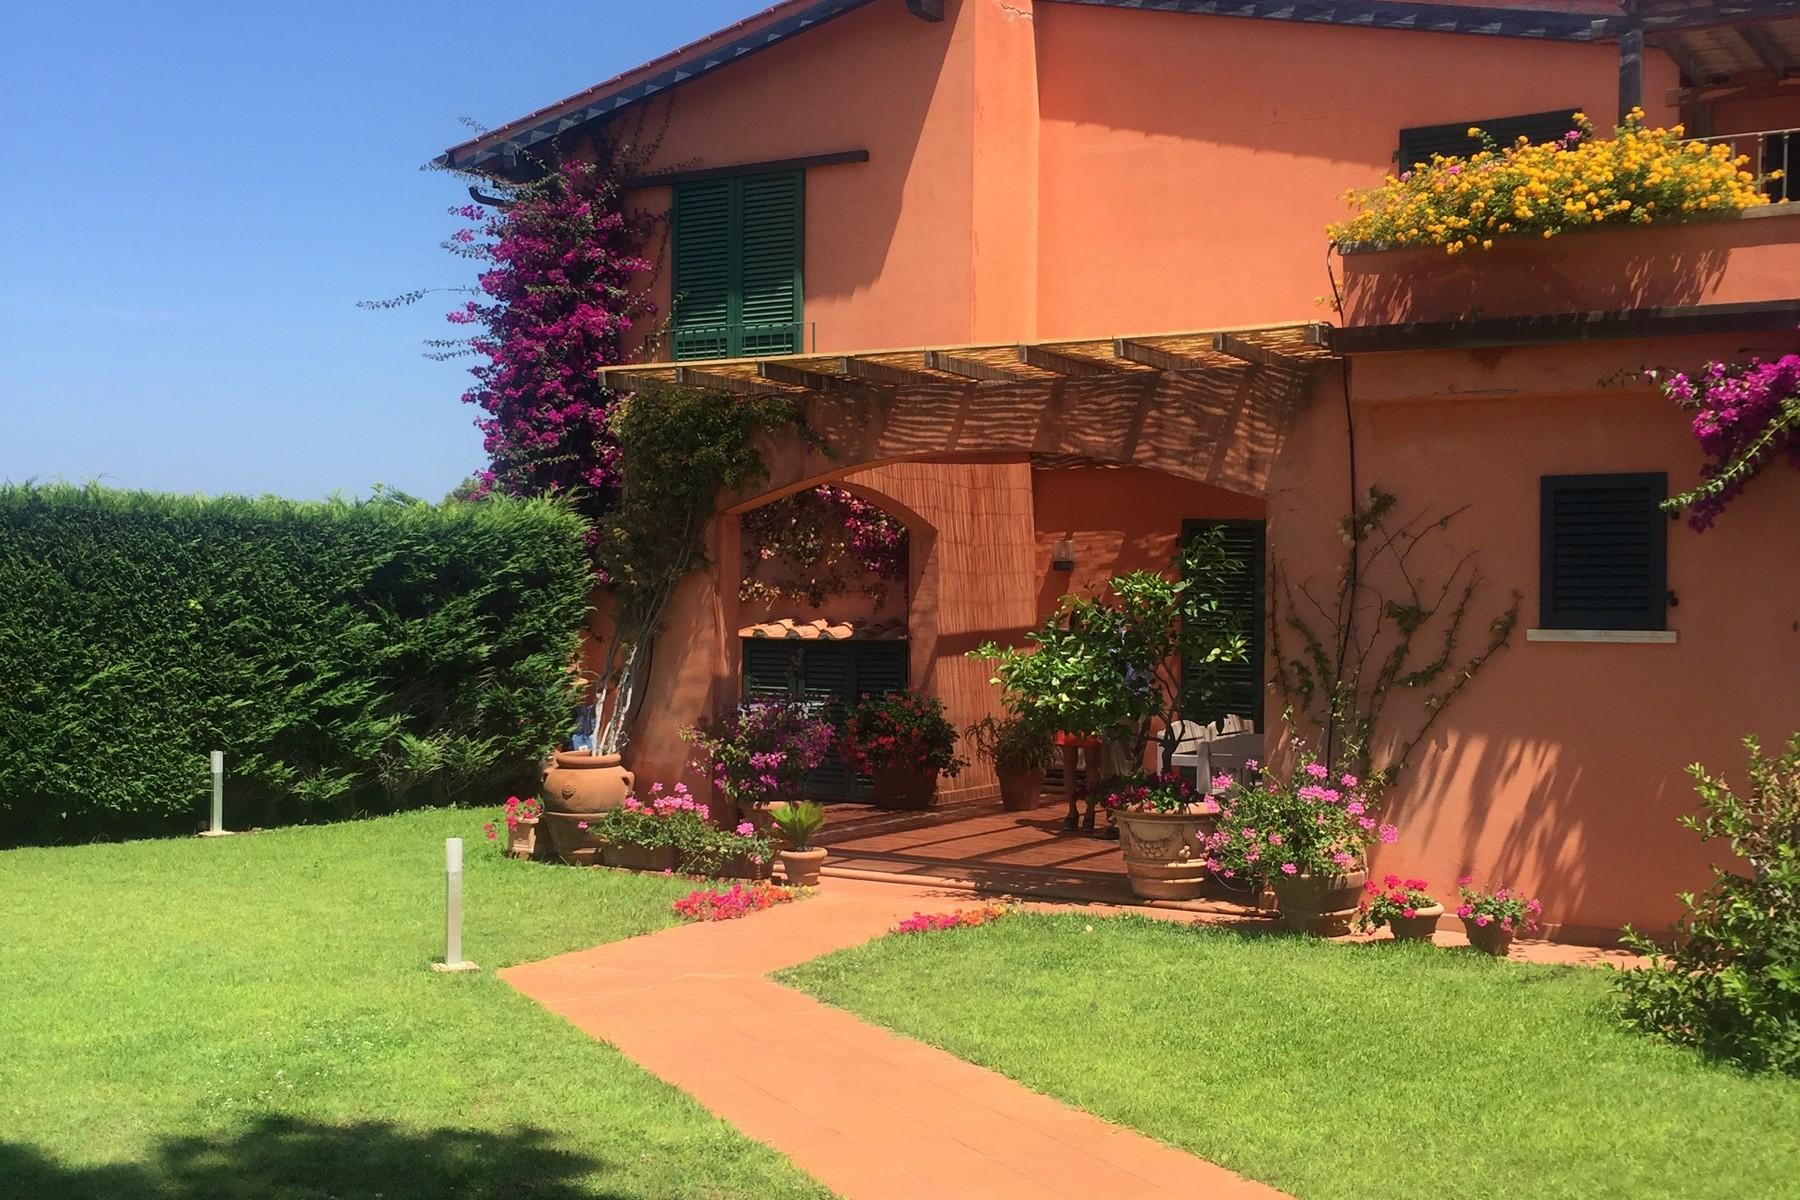 Casa indipendente in Vendita a Capoliveri: 5 locali, 190 mq - Foto 3